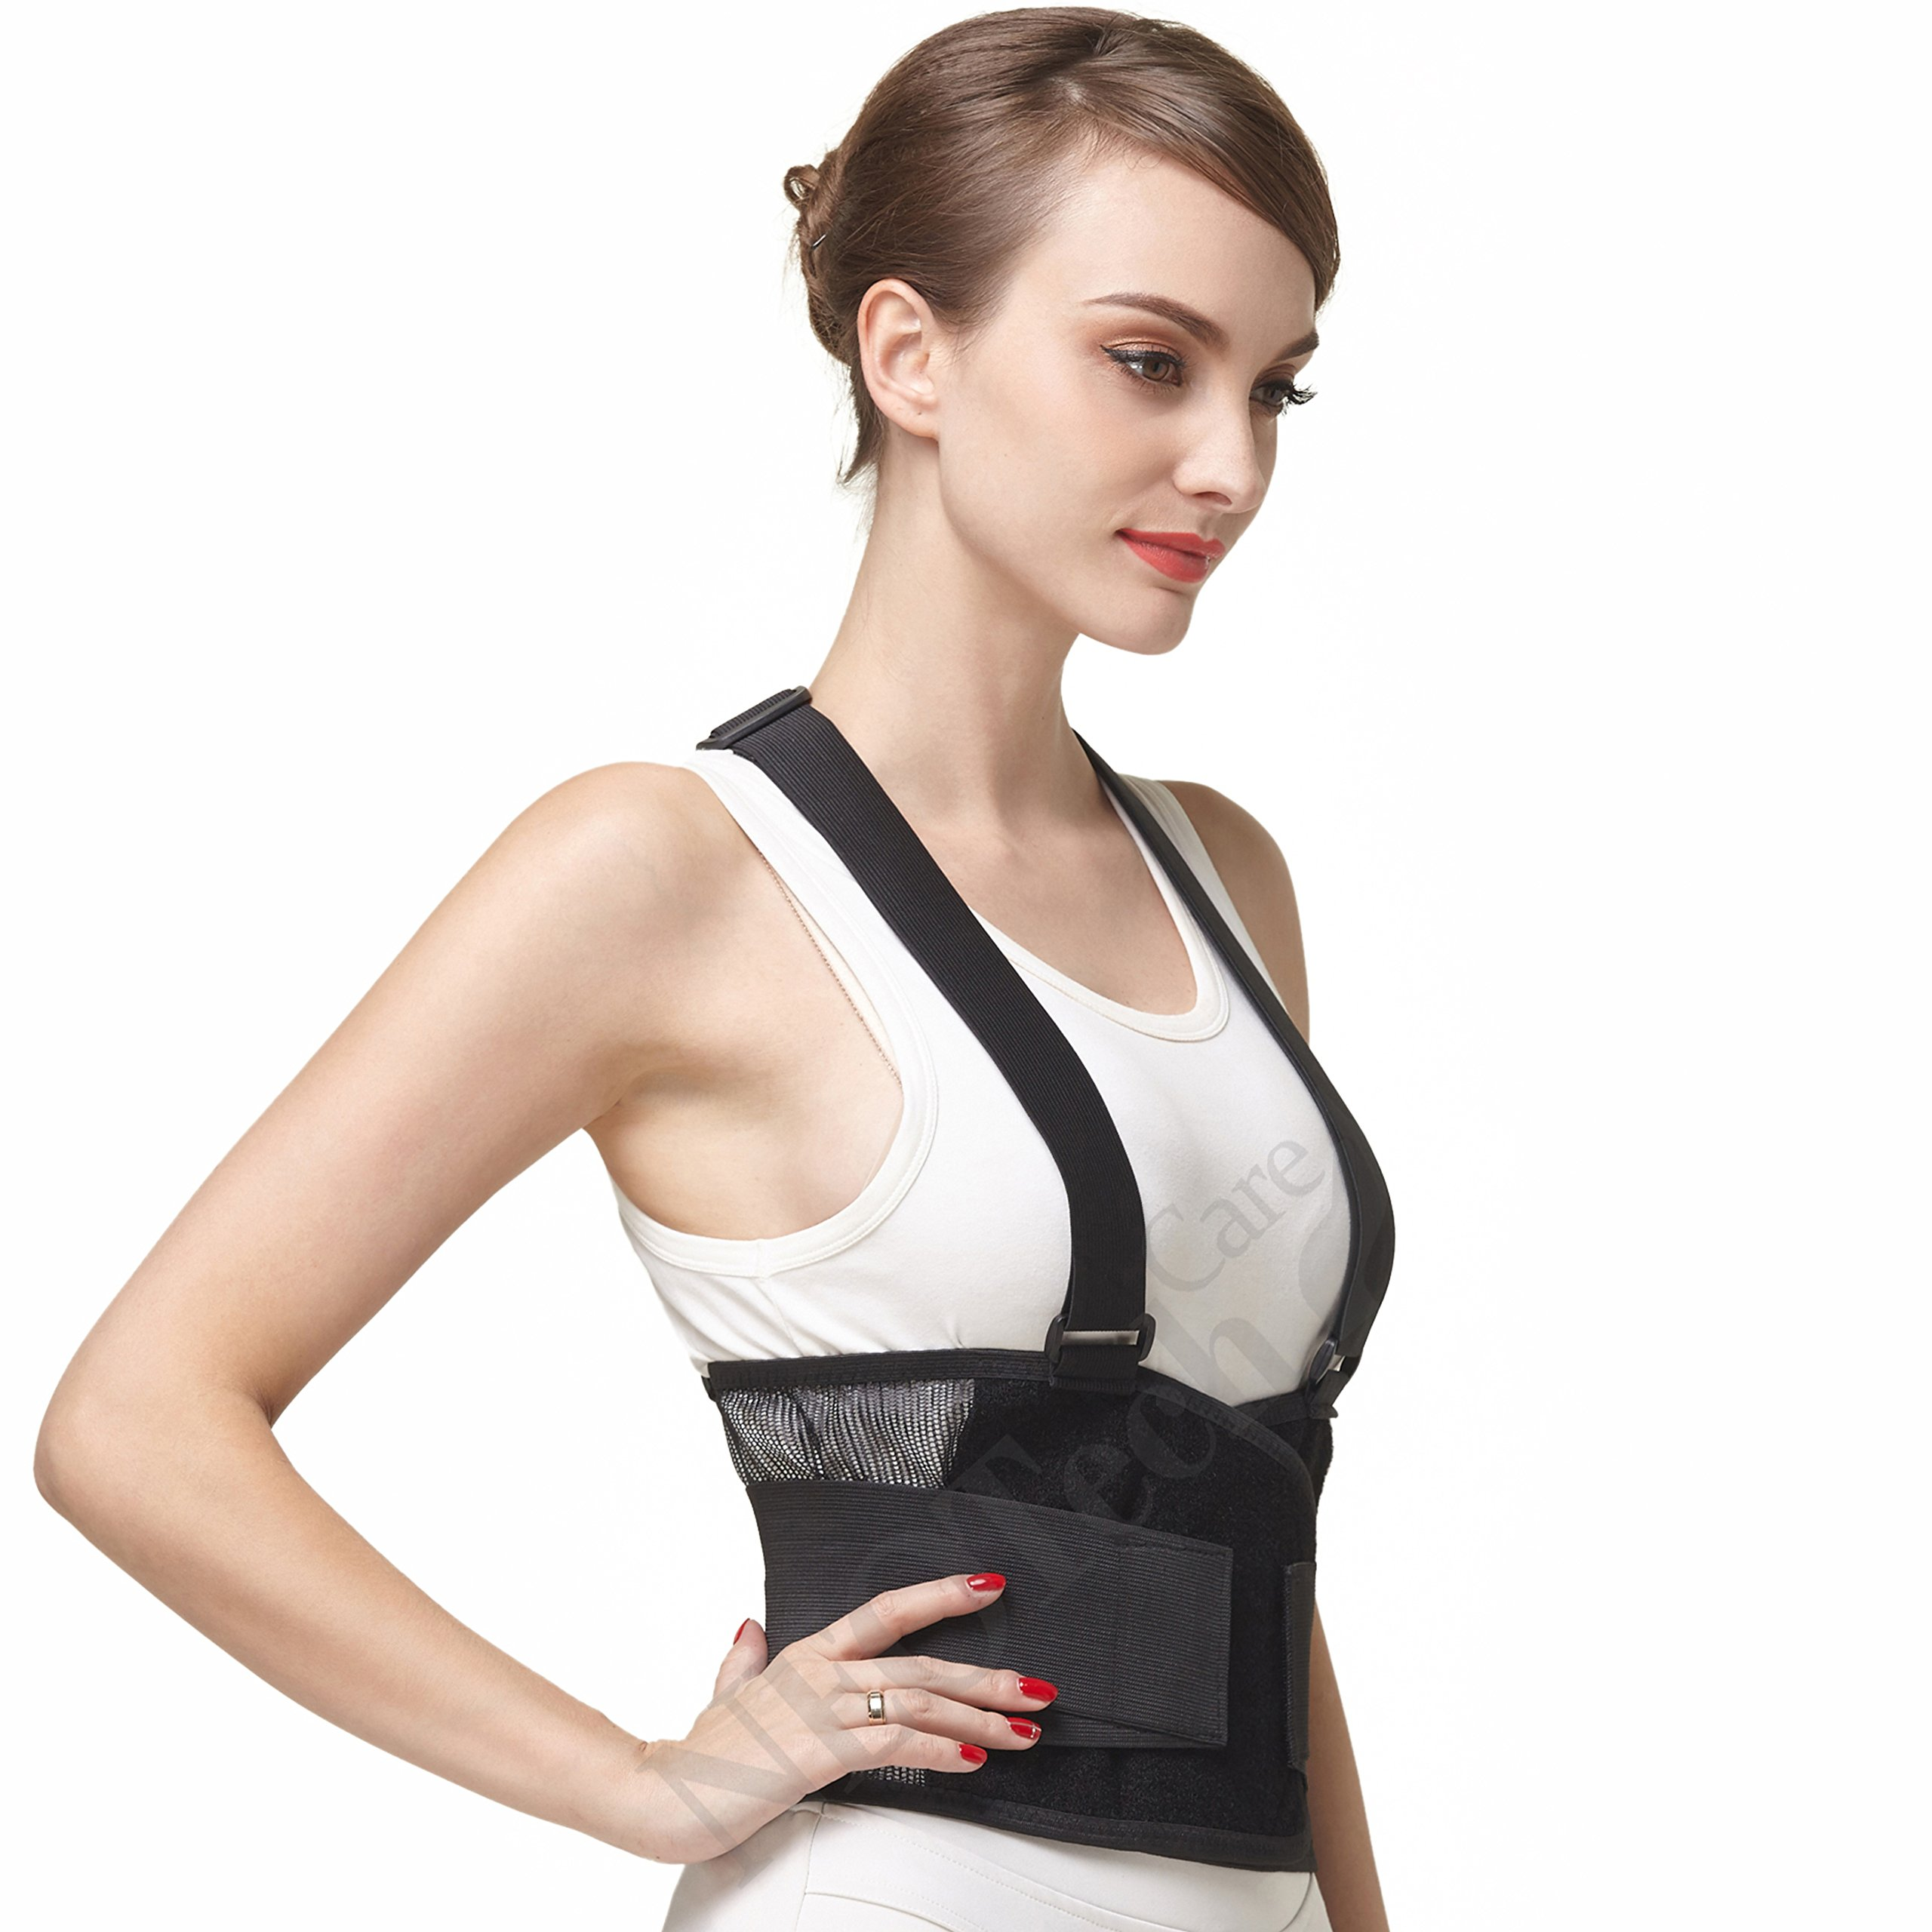 Back Brace with Suspenders/Shoulder Straps - Light & Breathable - Lumbar Support Belt for Lower Back Pain - Posture, Work, Gym - Neotech Care Brand - Black Color - Size S